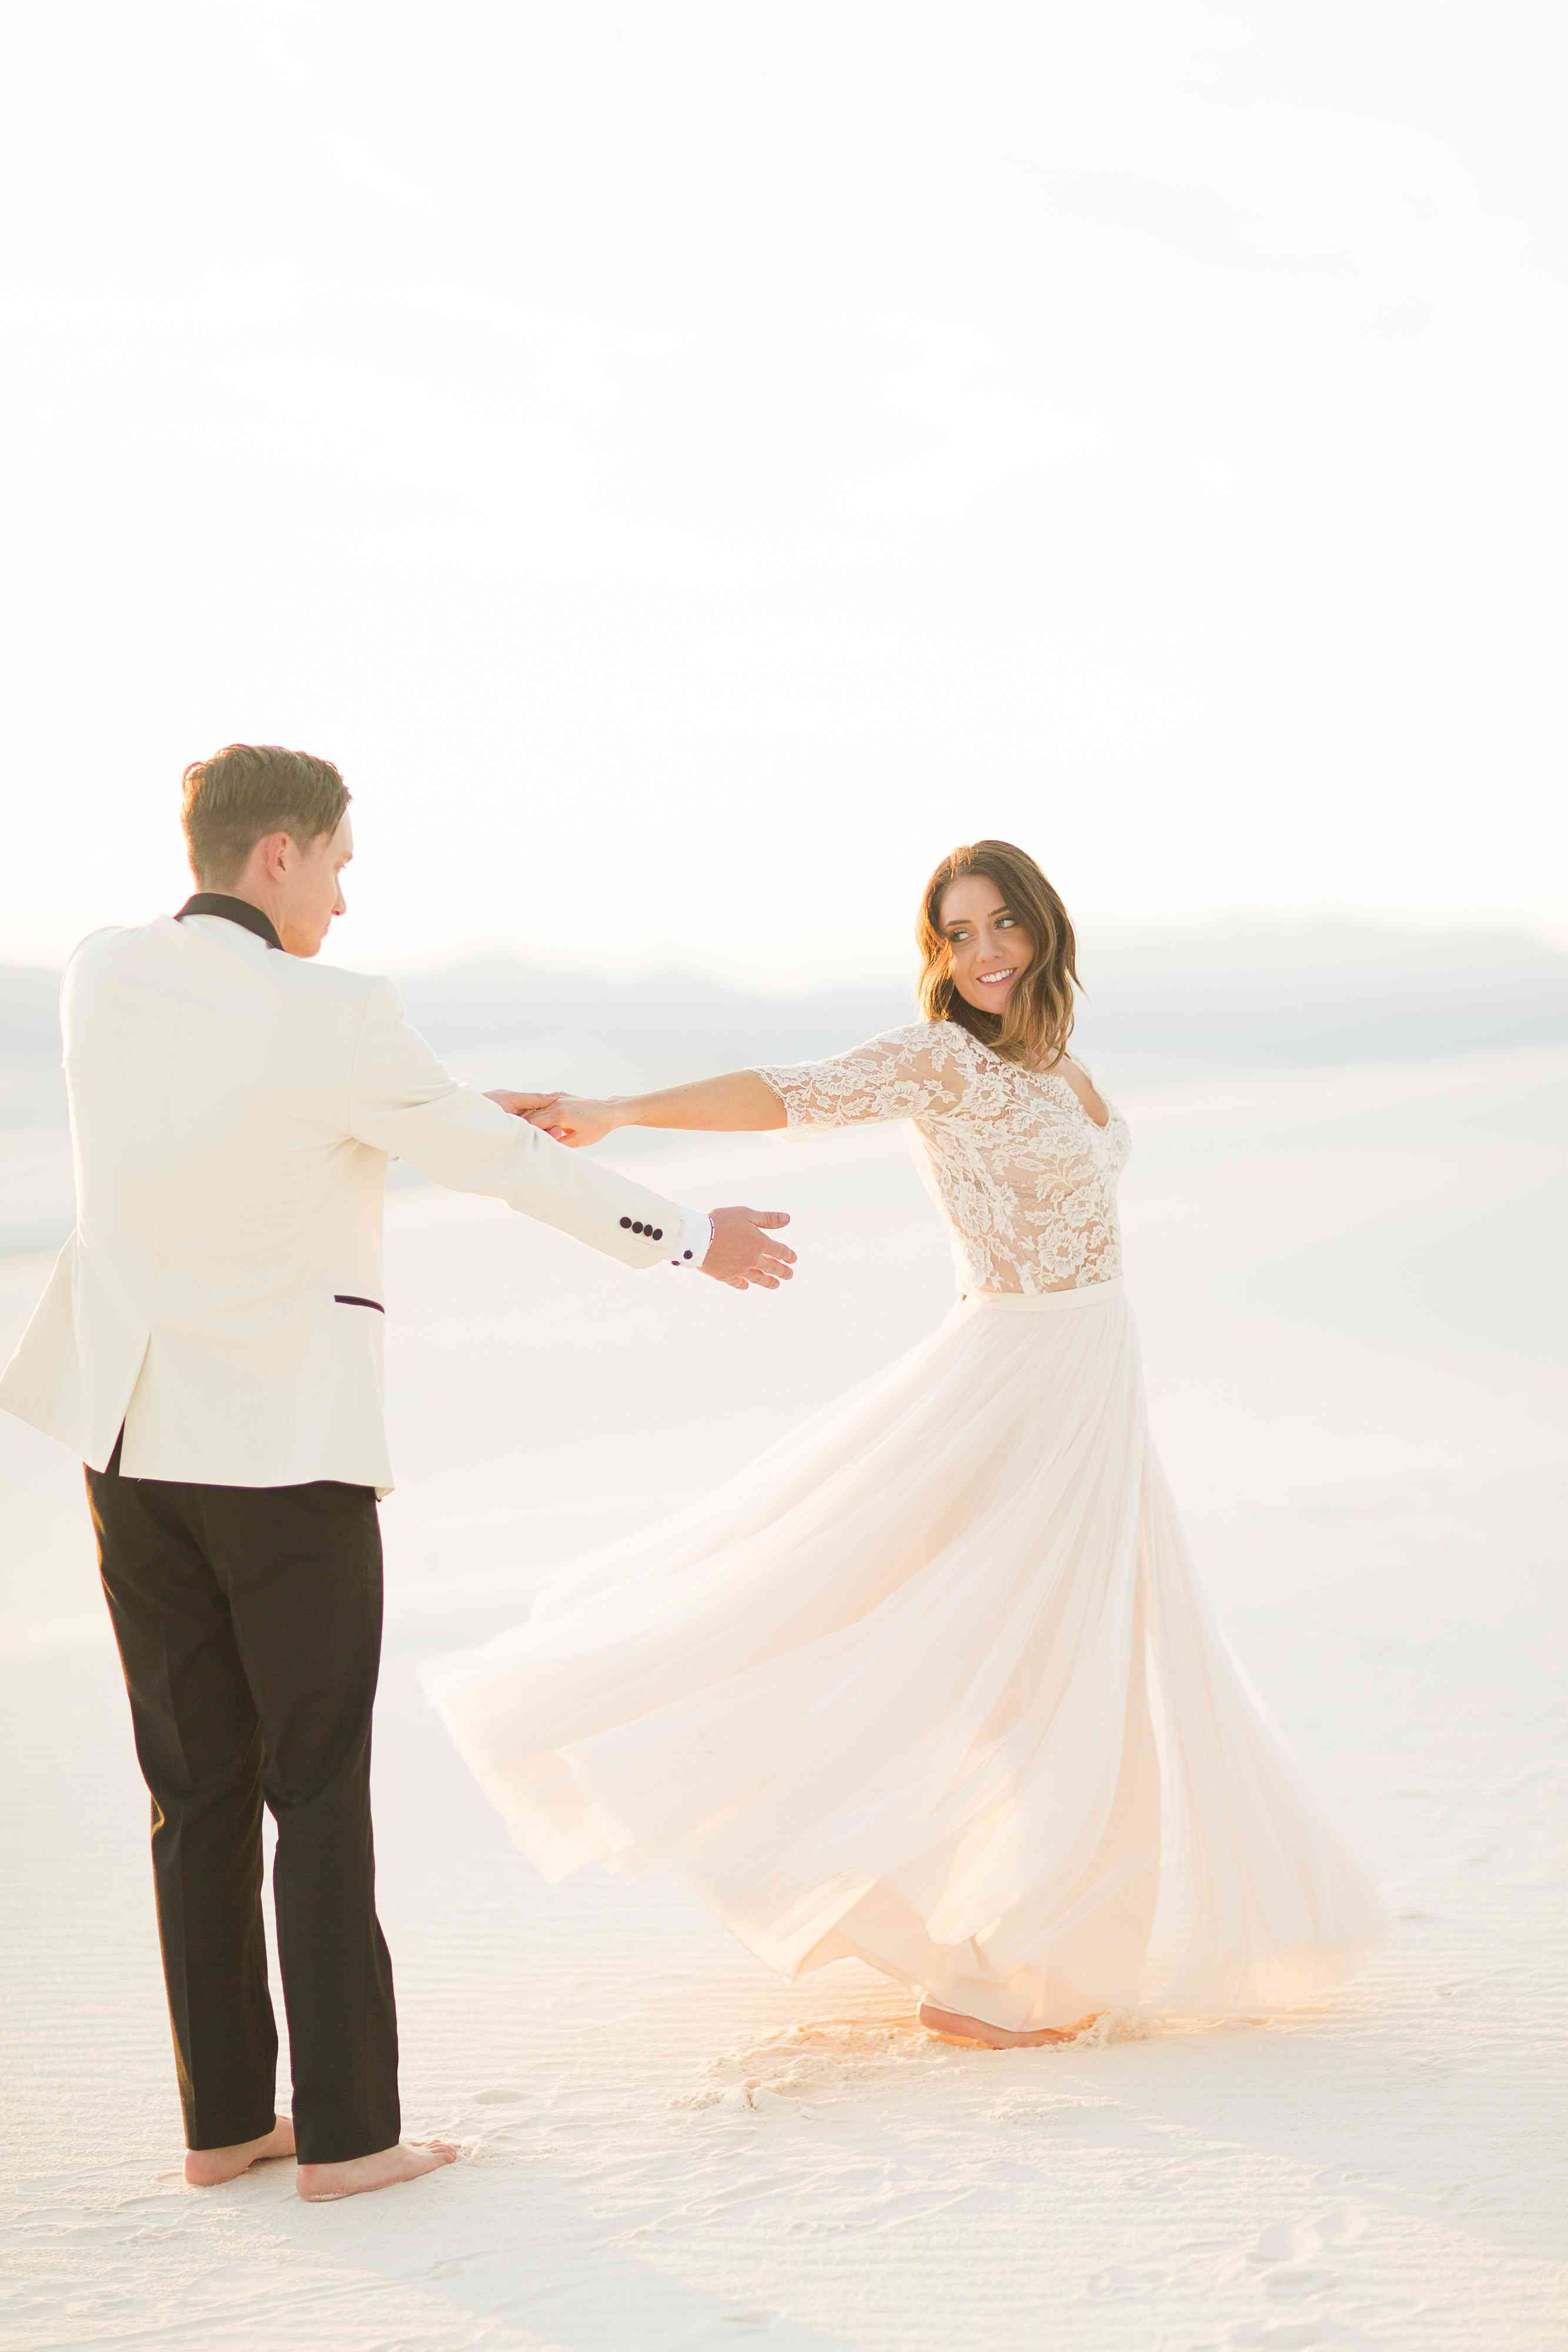 Bride and Groom Desert Wedding Portrait